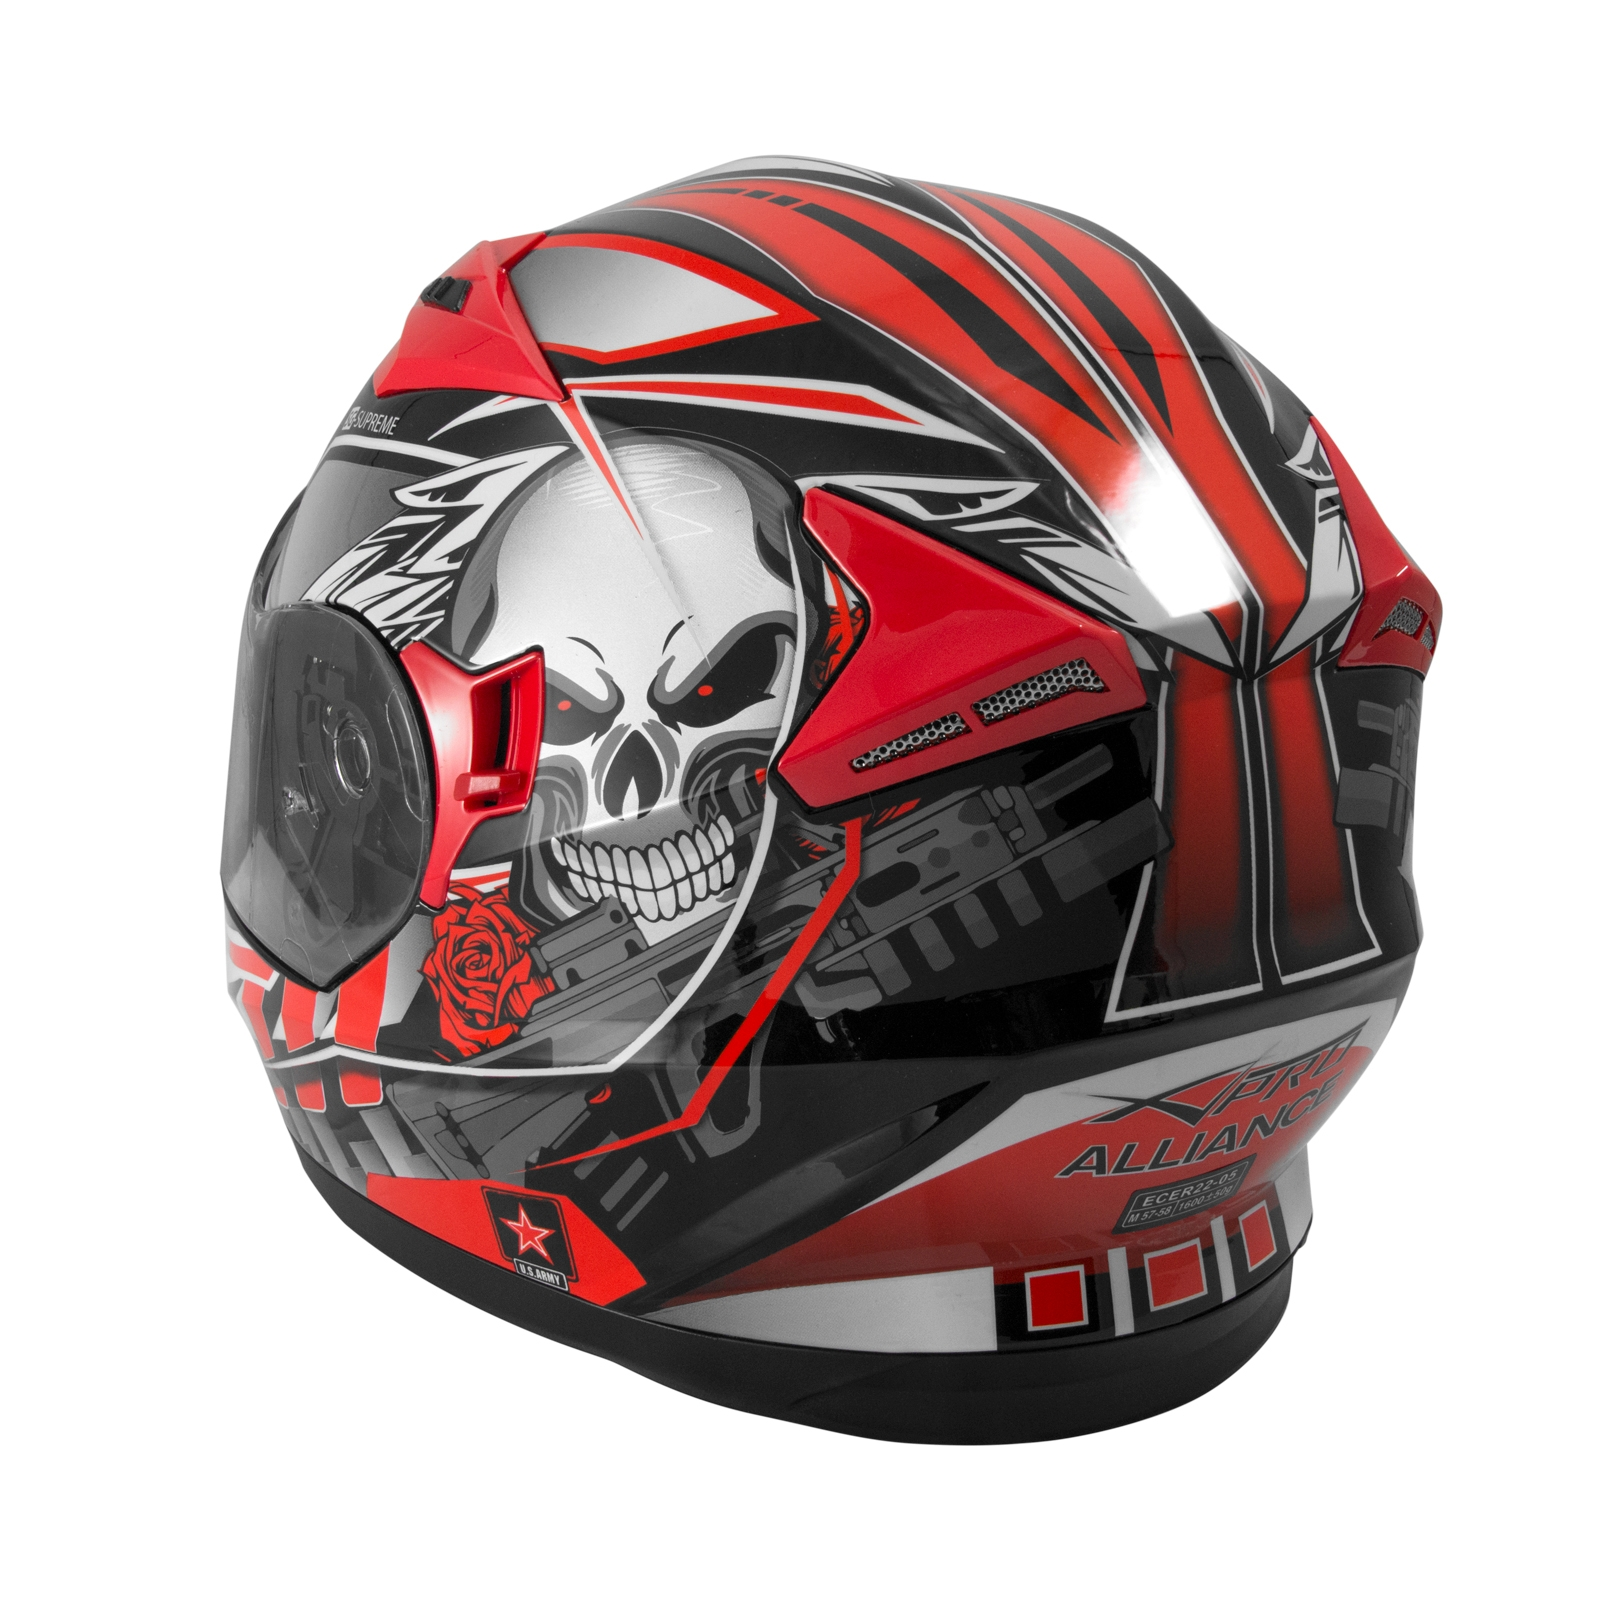 casco integrale ece 22 05 moto scooter visiera parasole. Black Bedroom Furniture Sets. Home Design Ideas